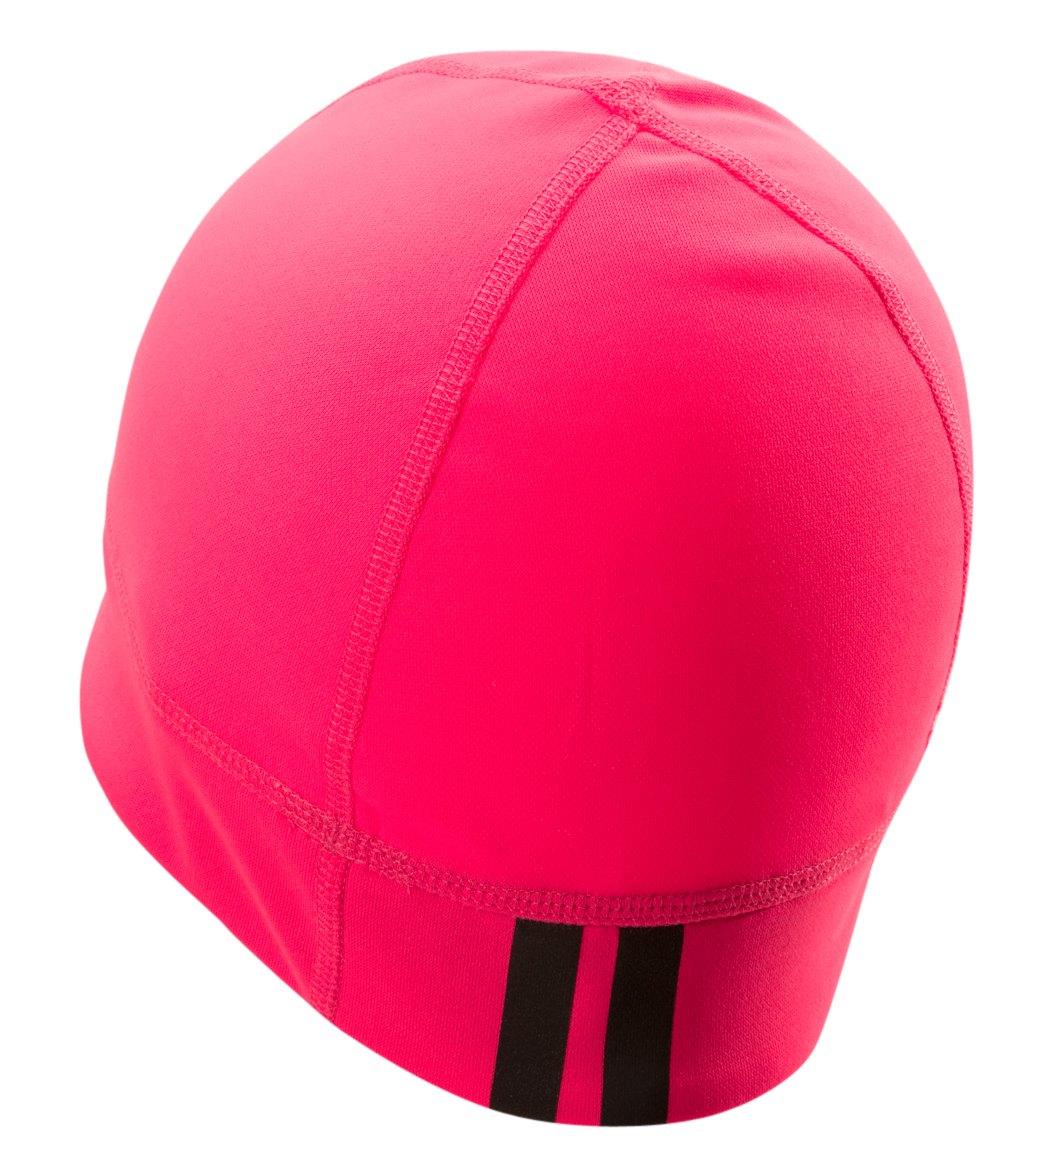 42267f380a4 Pearl Izumi Thermal Run Hat at SwimOutlet.com